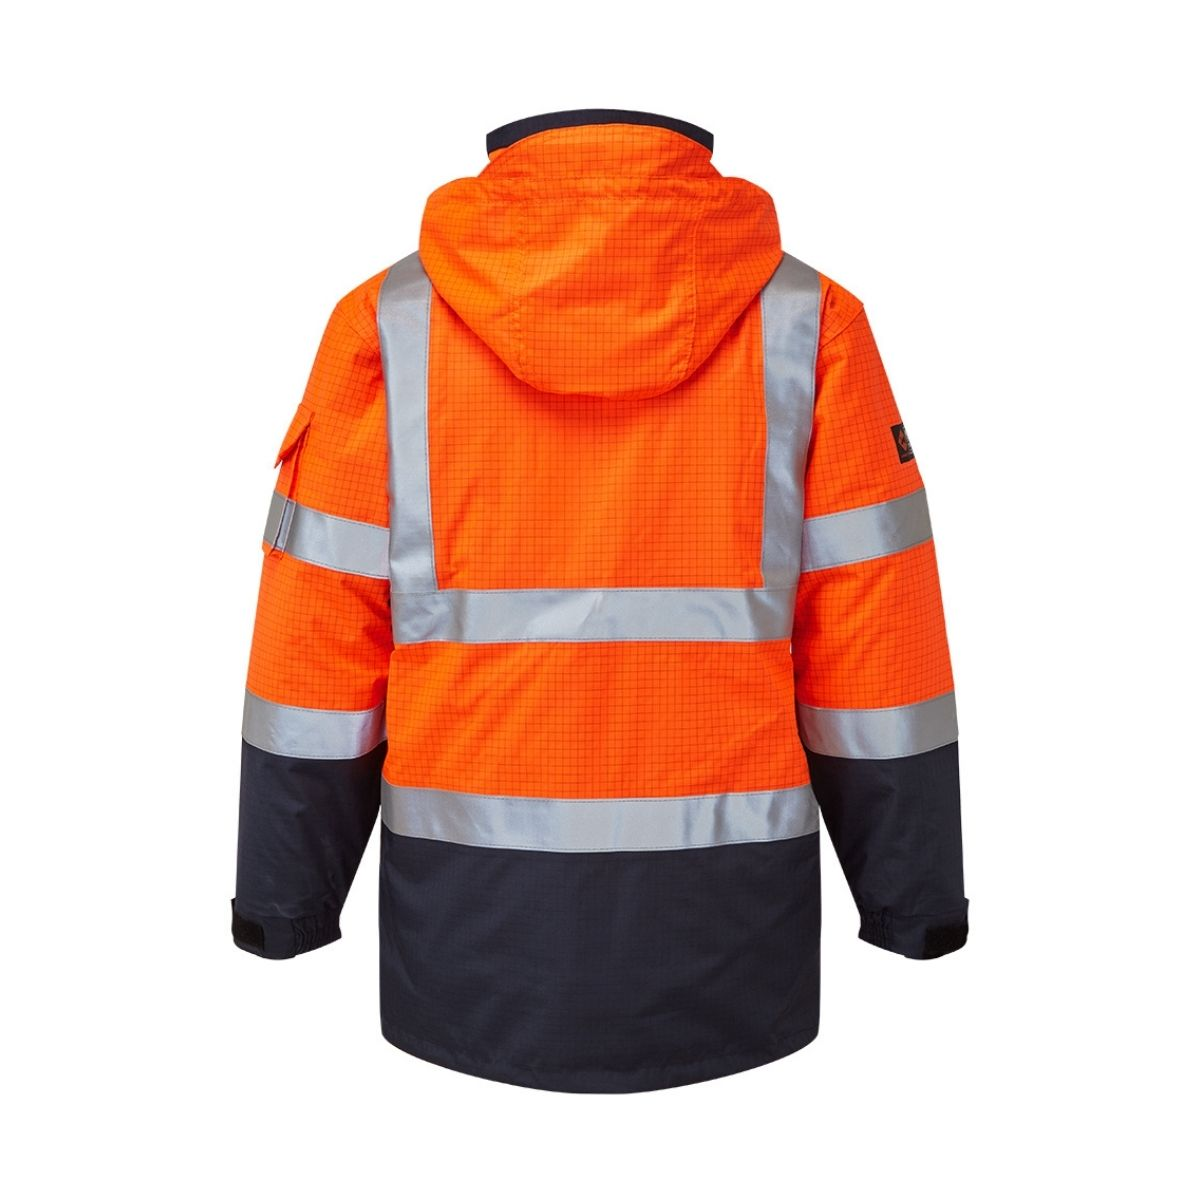 AS9464 HAZTEC® Boulton FR AS Hi-Visibility Waterproof Traffic Jacket - Orange_Navy Back